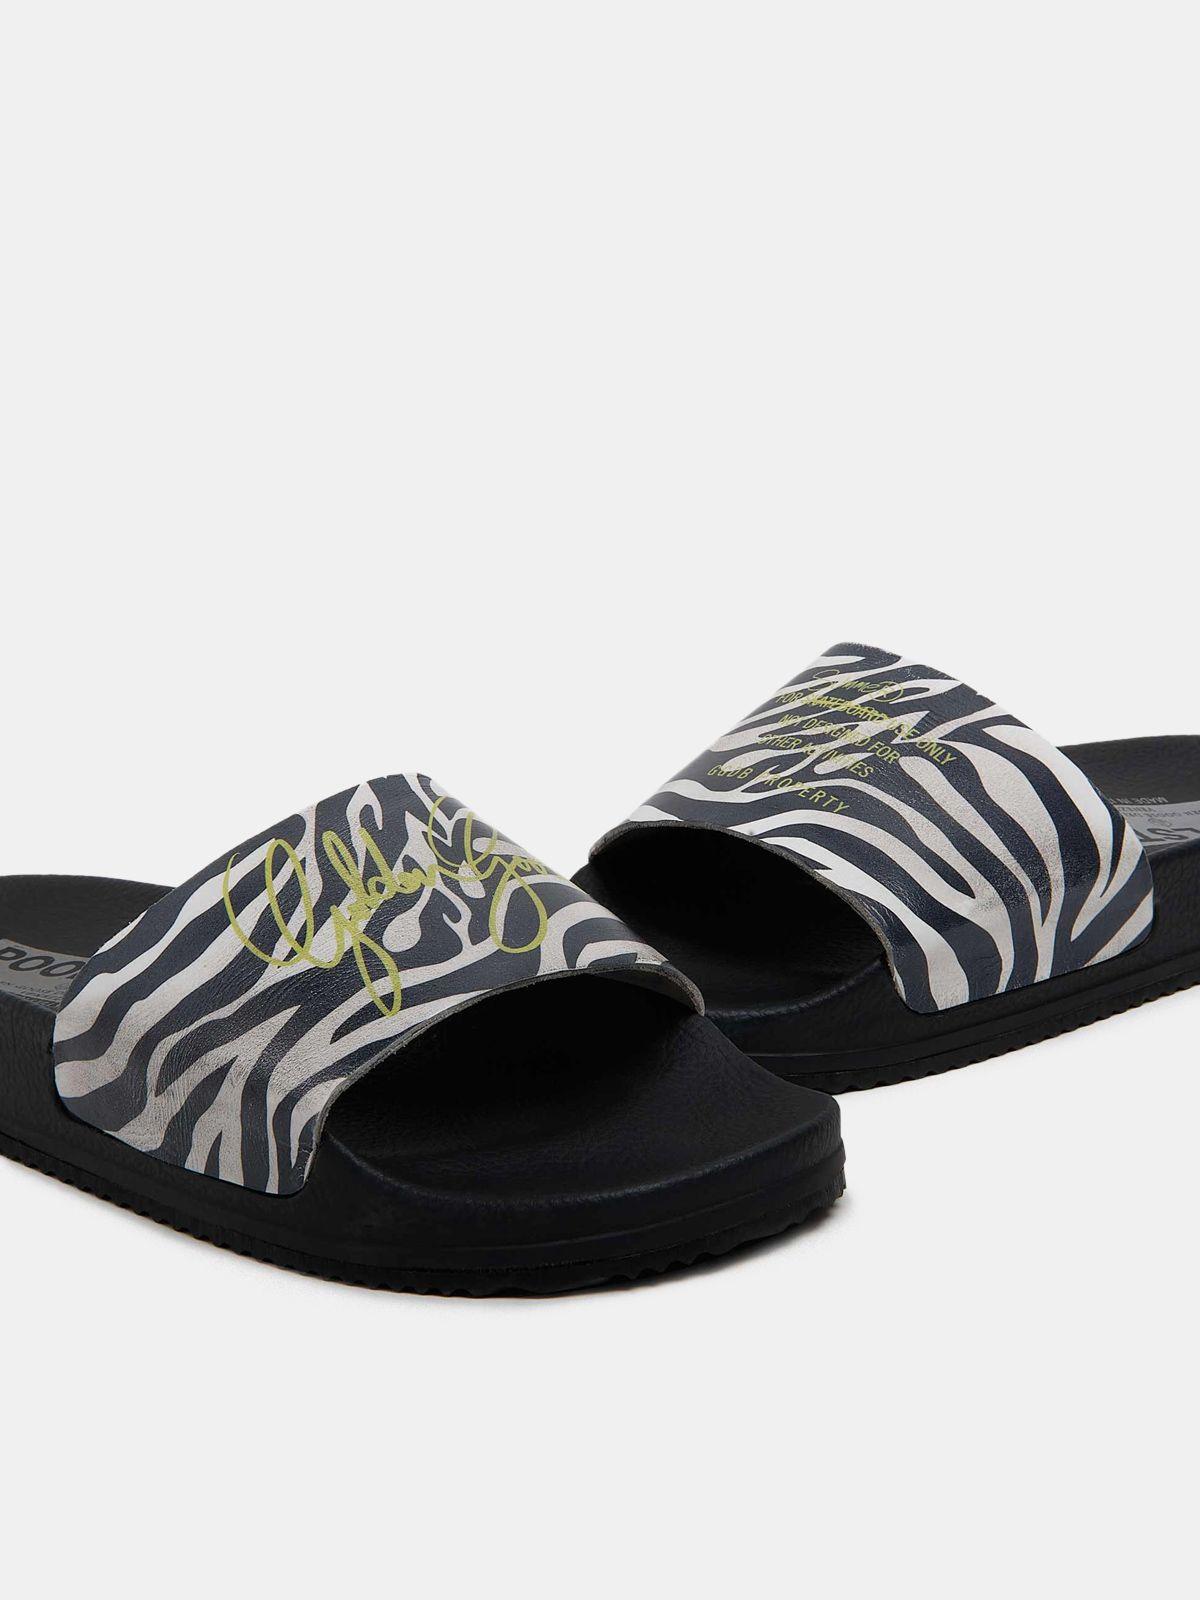 Golden Goose - Women's Poolstars with zebra-pattern strap in